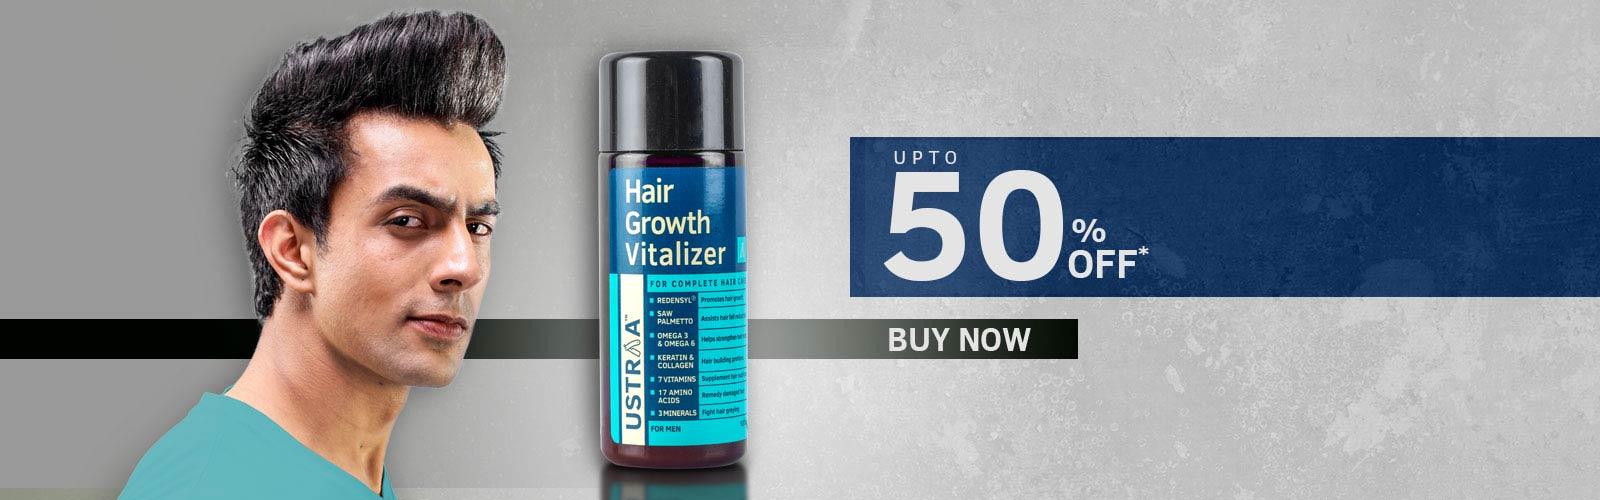 Hair growth Vitalizer